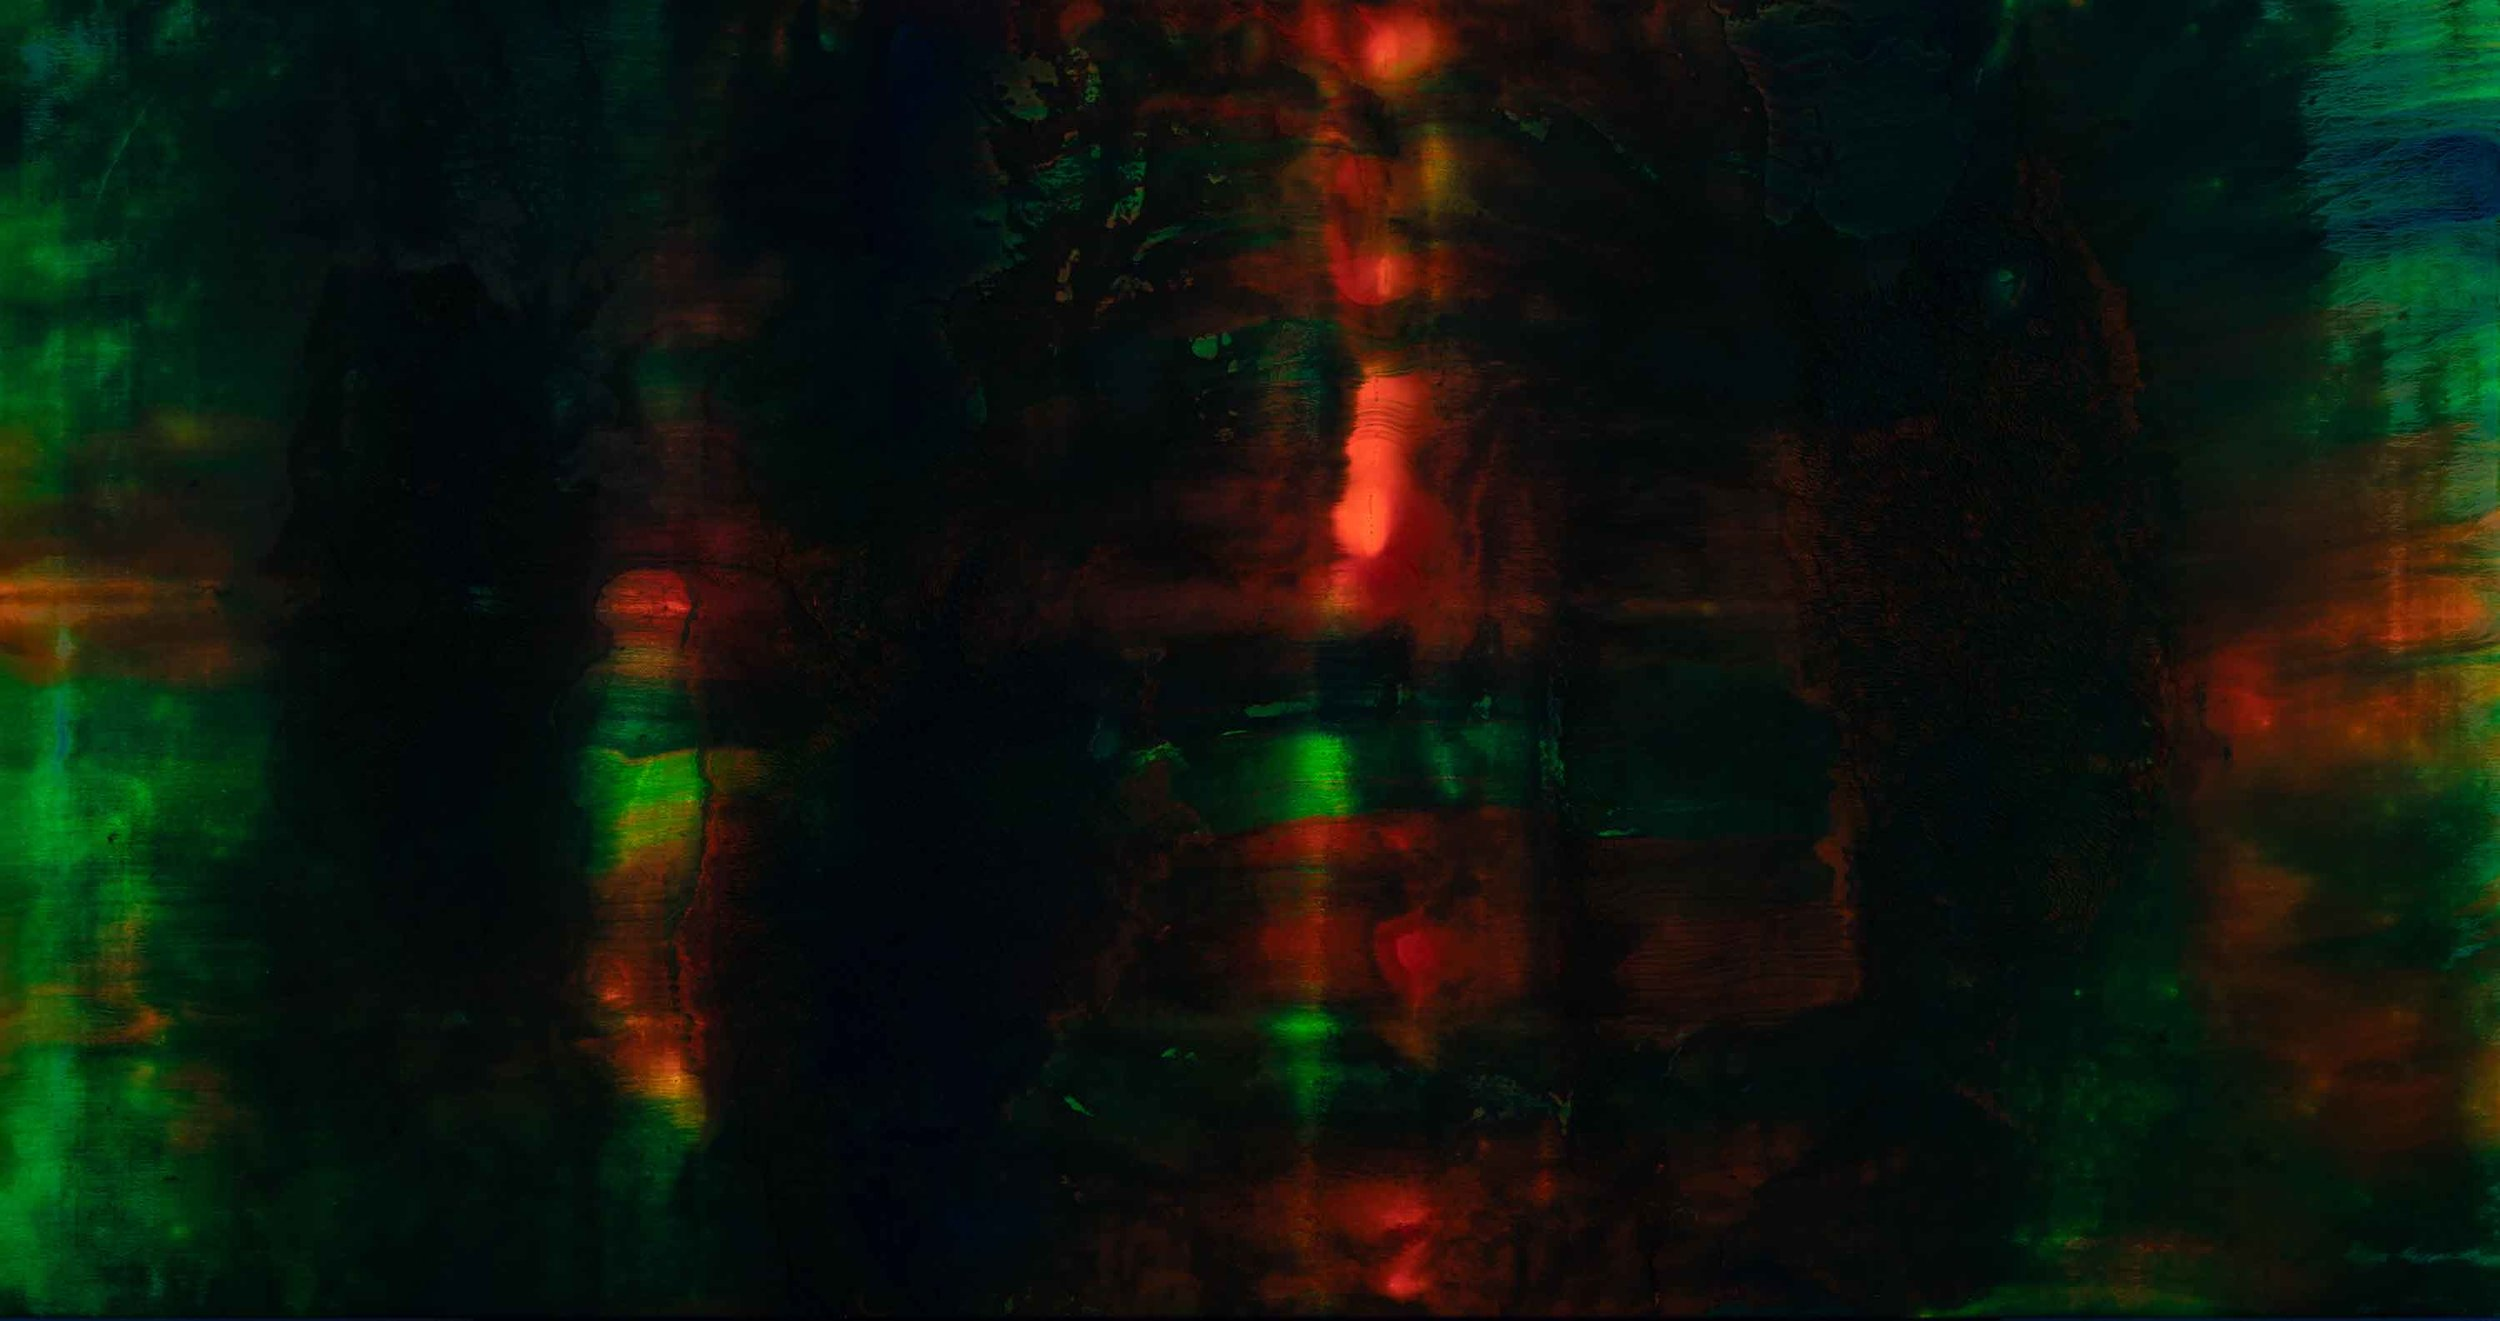 CODE UVS #8  2017 /105X200 cm  UV LIGHT exposure